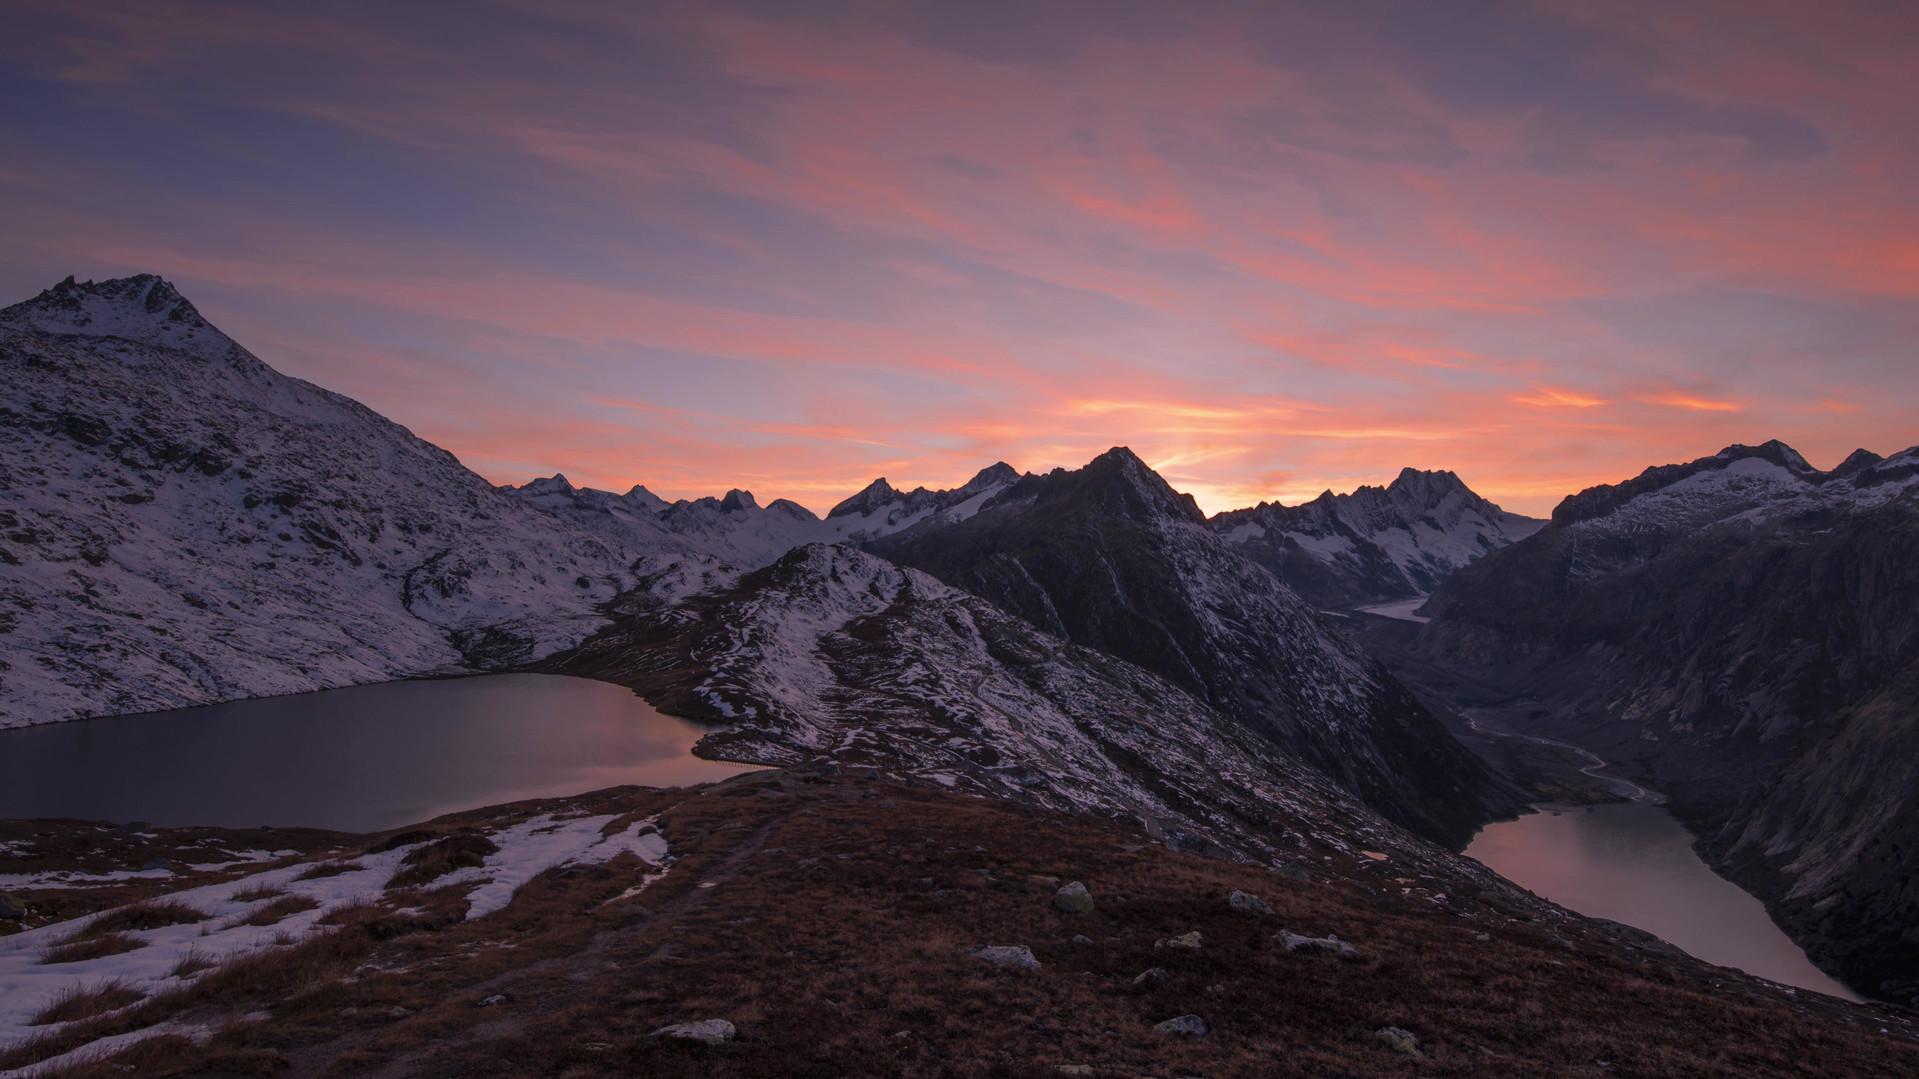 Time lapse tramonto Grimselpass.mp4